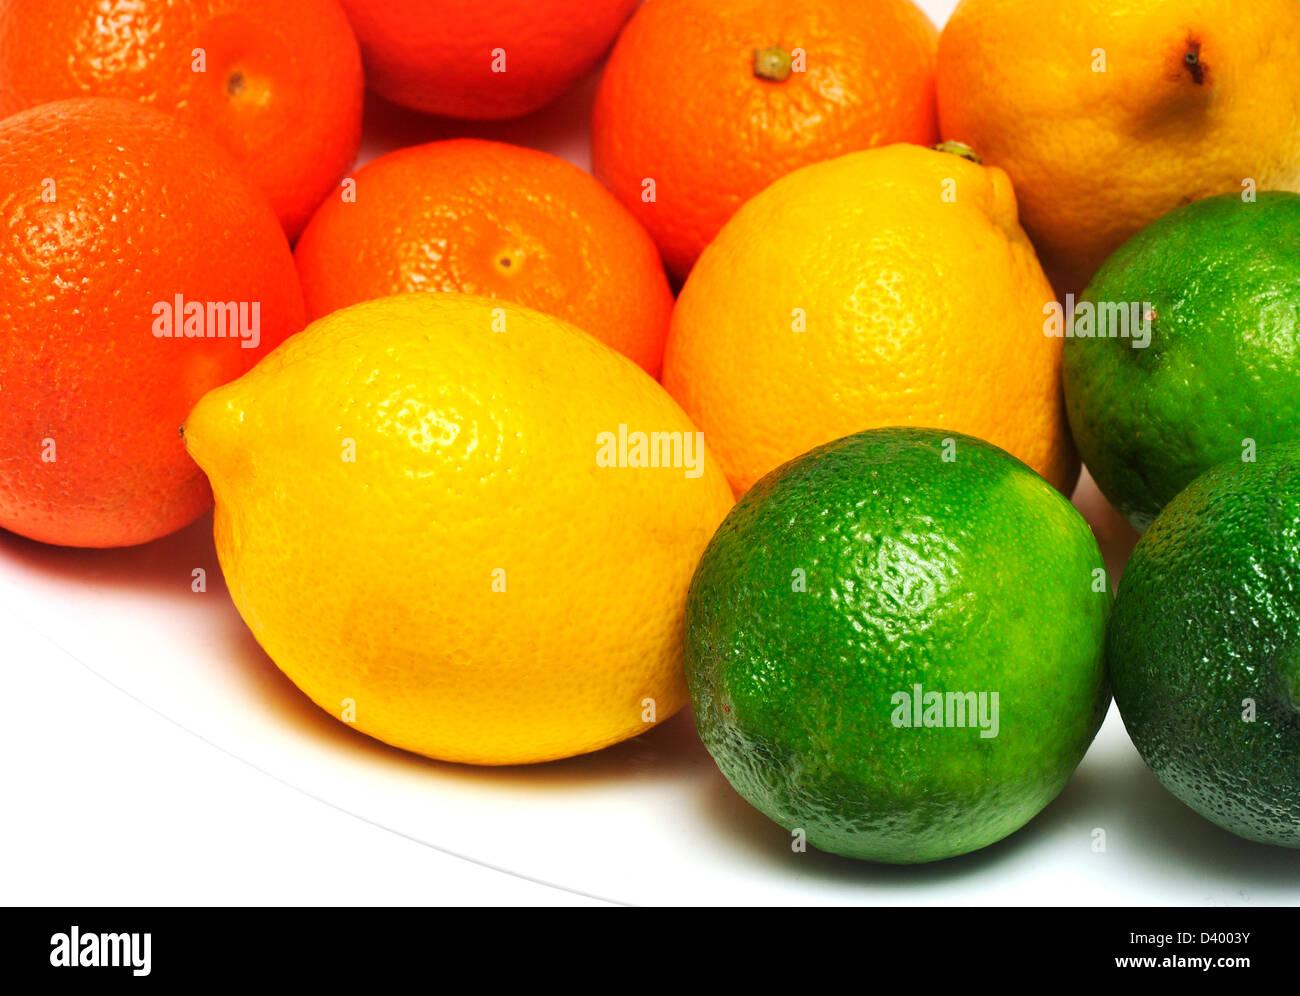 Mandarin oranges, lemons and limes in a bowl. - Stock Image